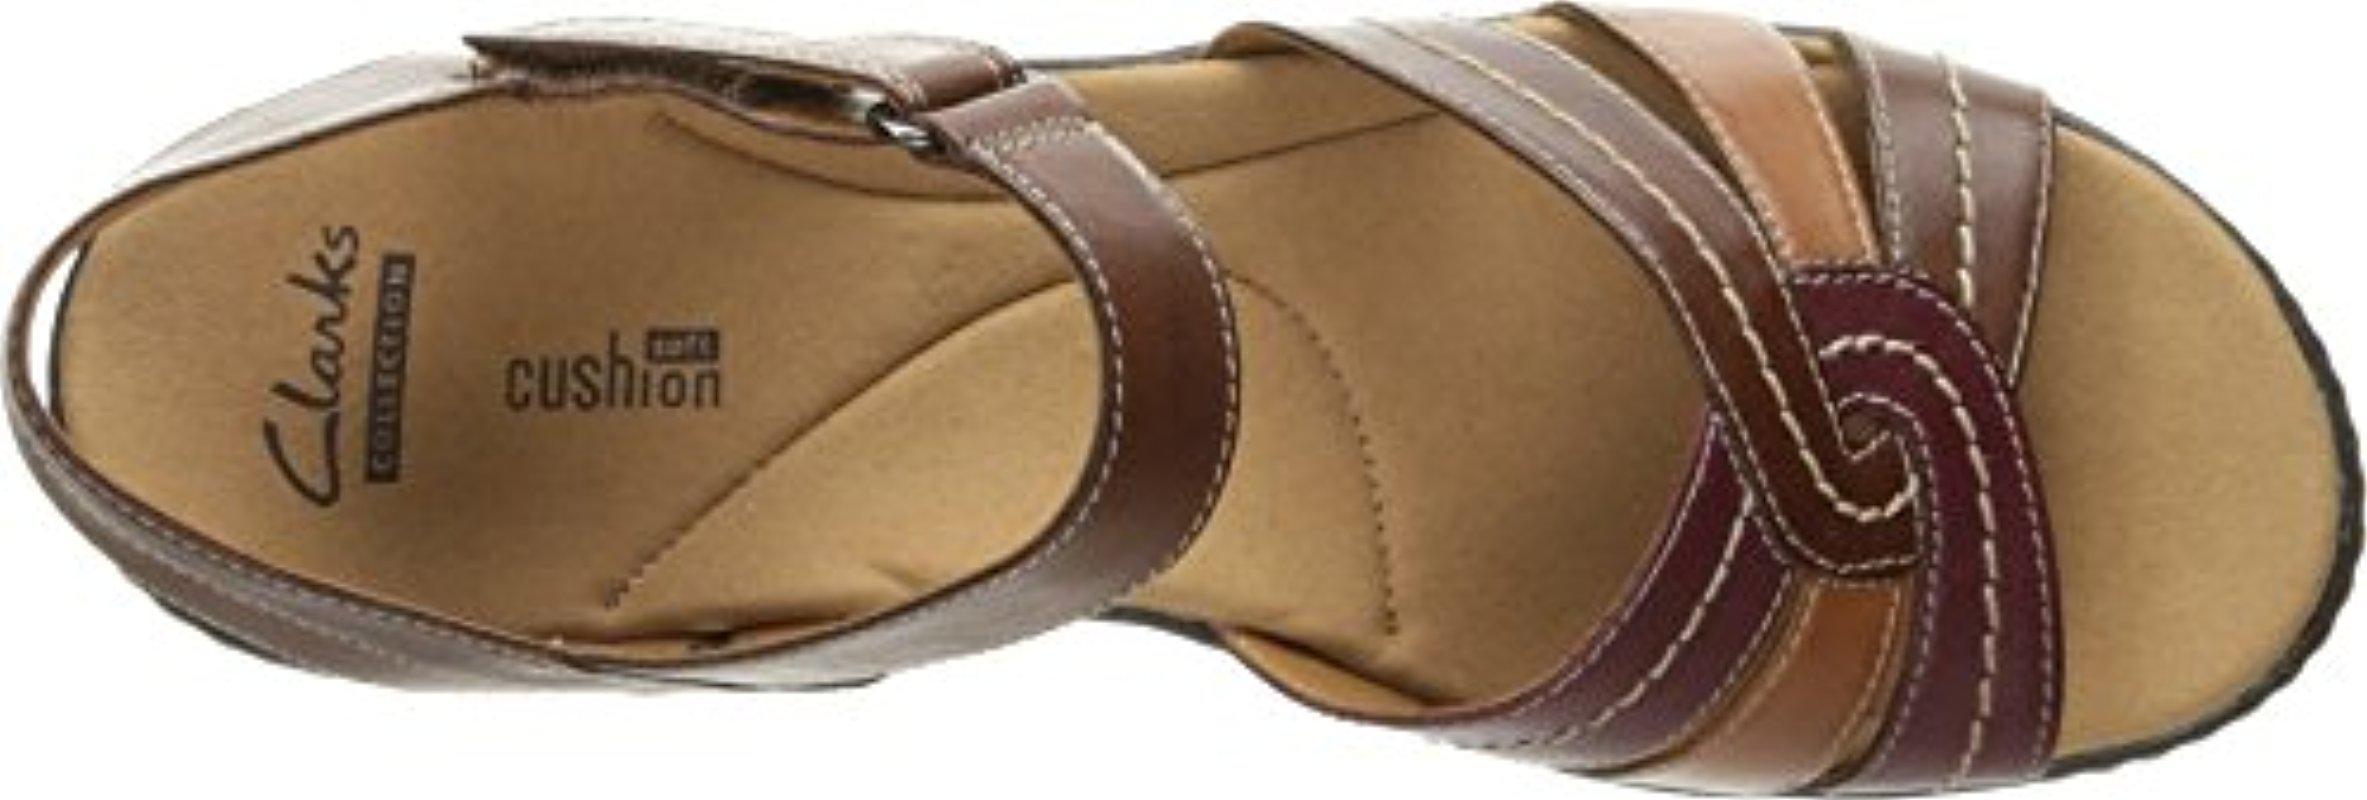 60643d290ac08b Lyst - Clarks Delana Varro Dress Sandal in Brown